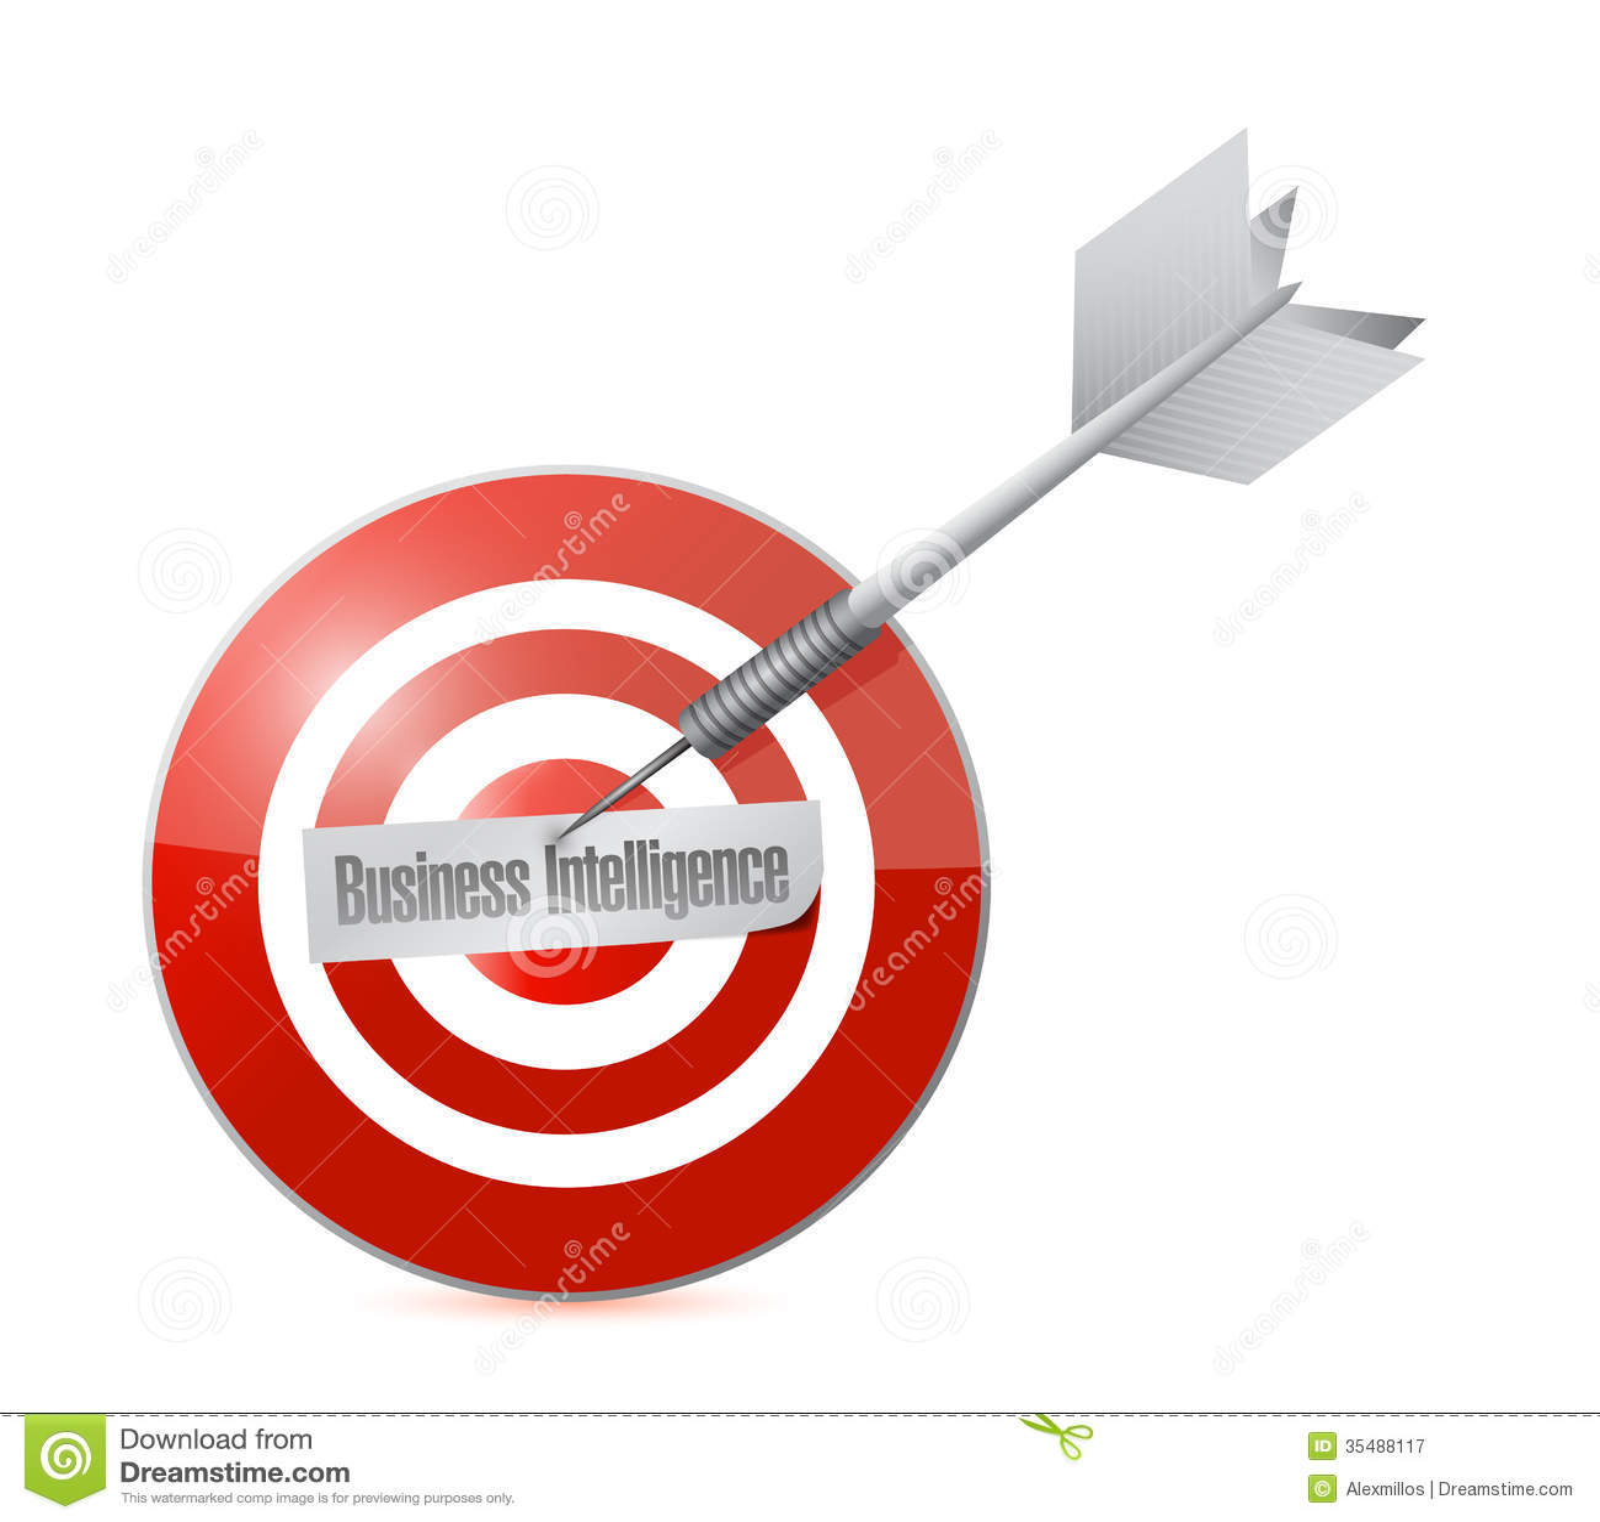 Target business intelligence illustration stock illustration royalty free stock photo buycottarizona Image collections